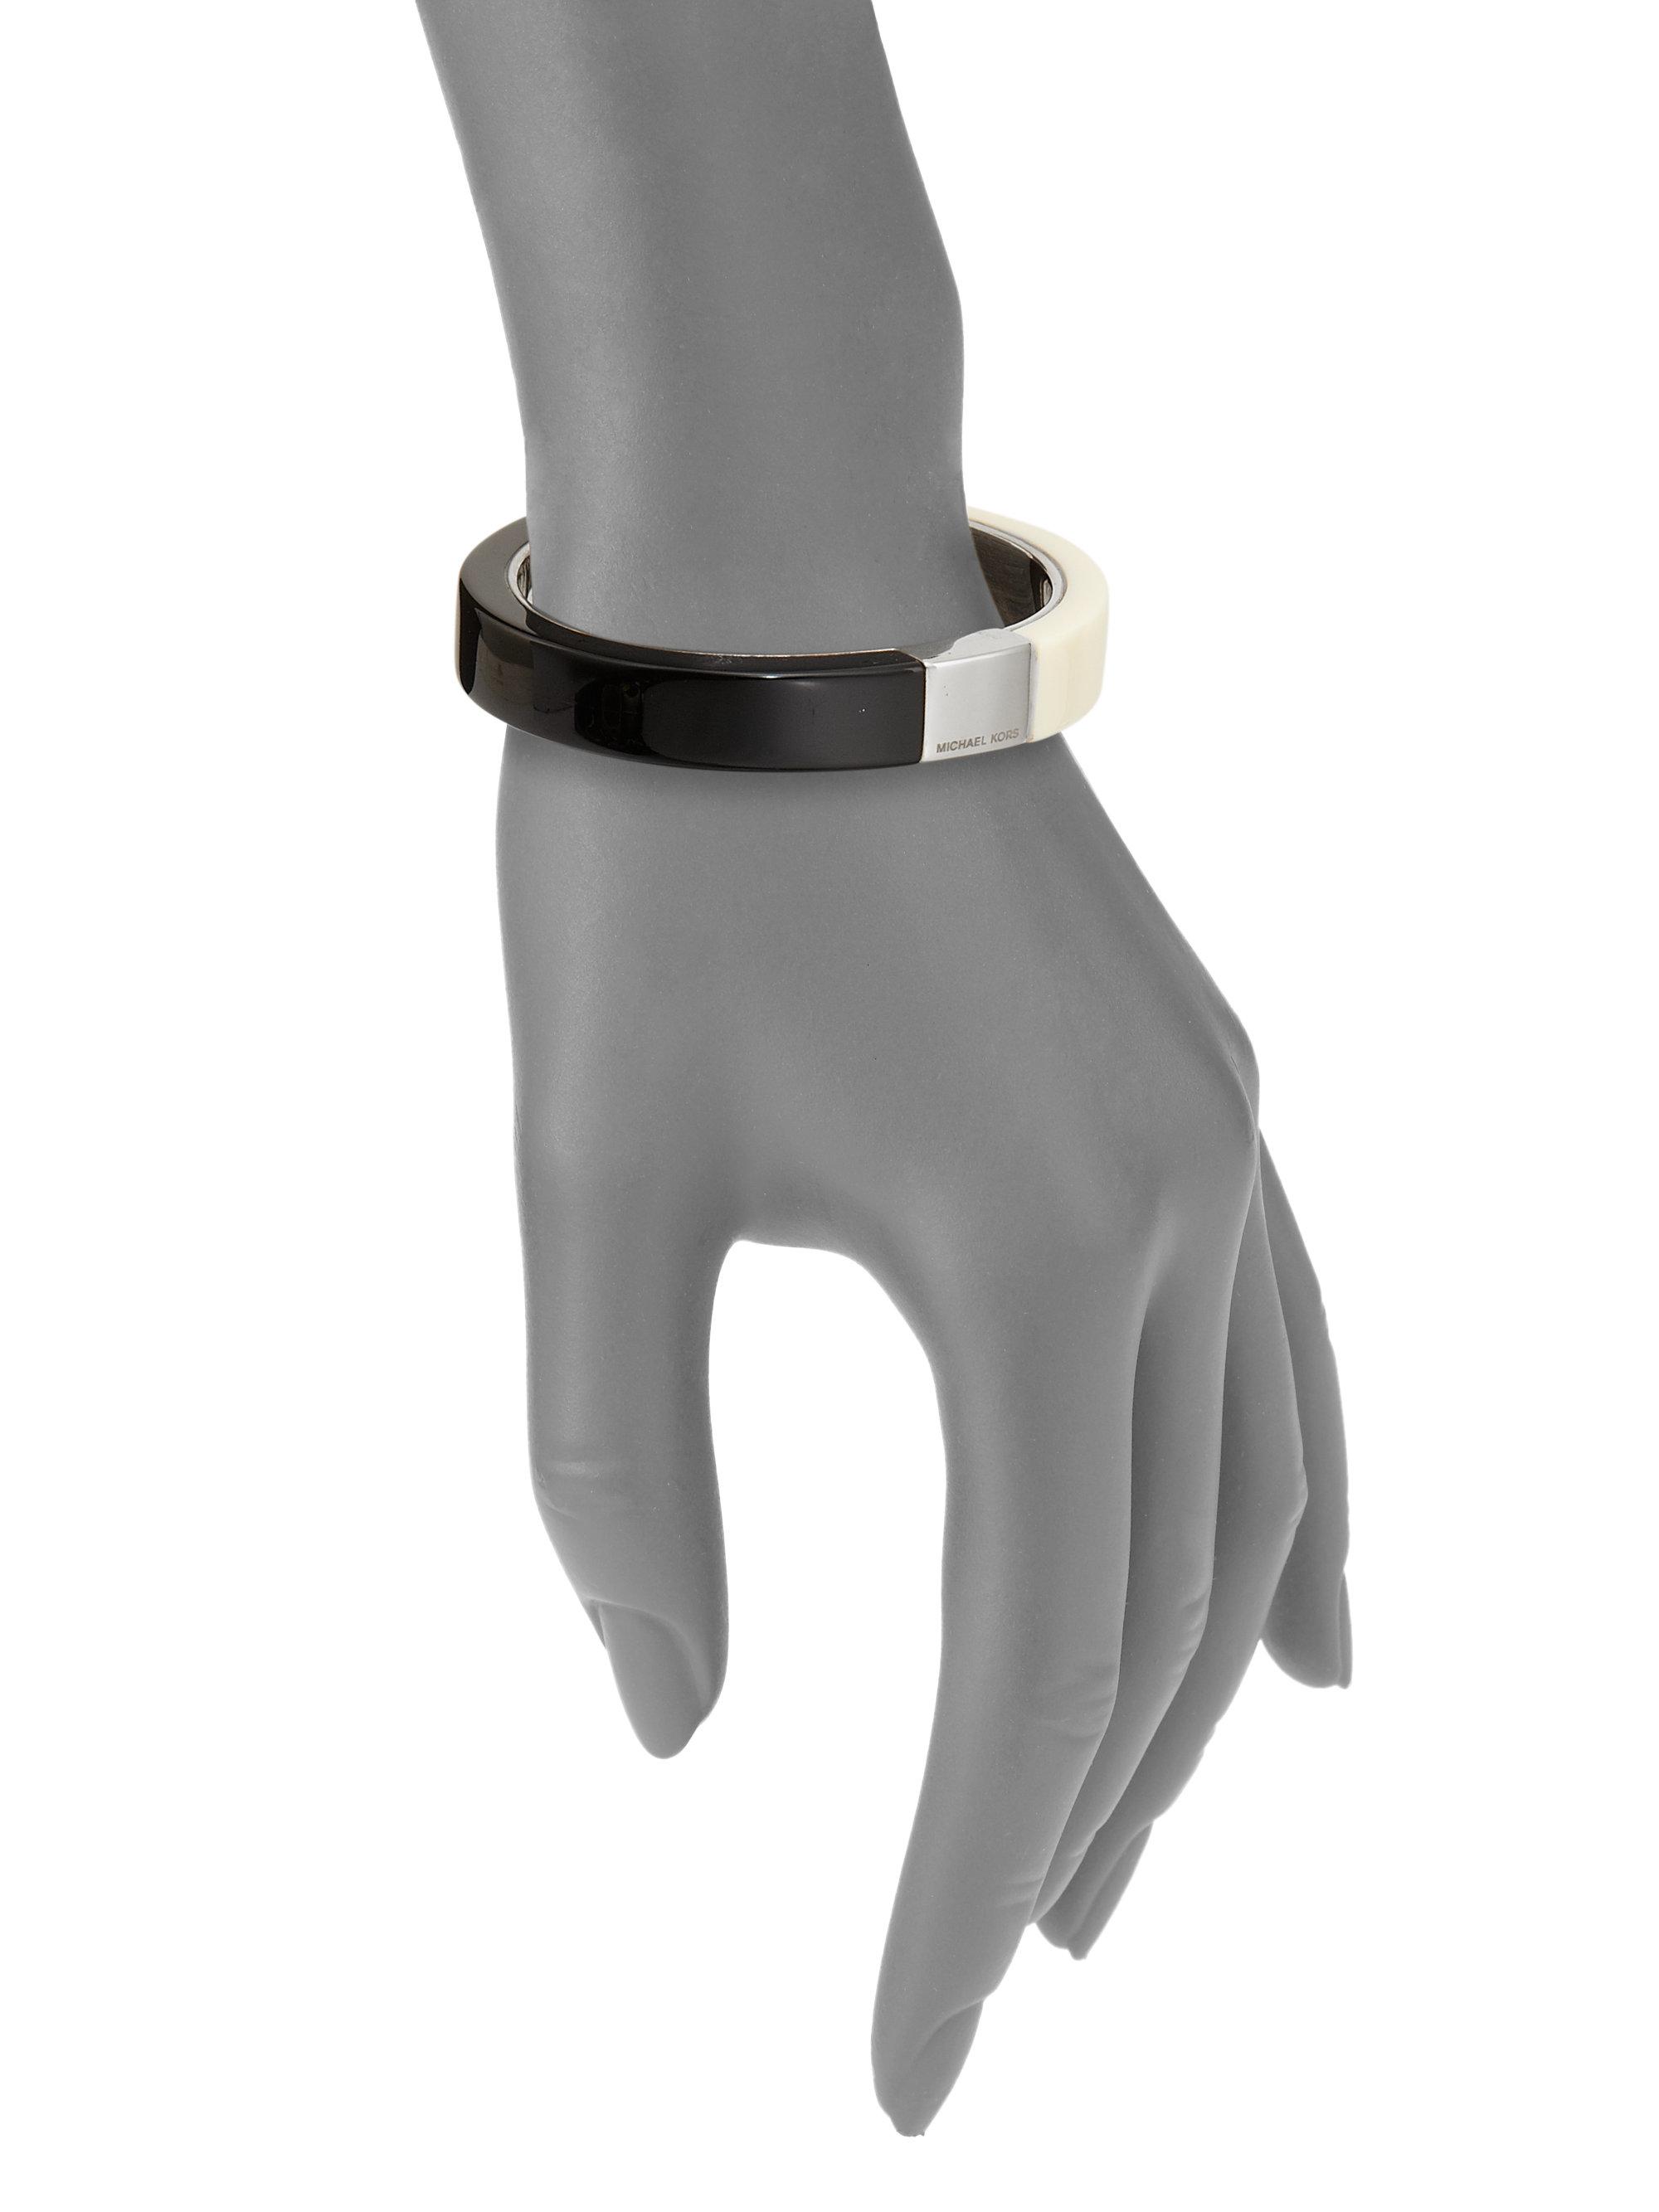 Lyst - Michael Kors Colorblock Bangle Bracelet in Black